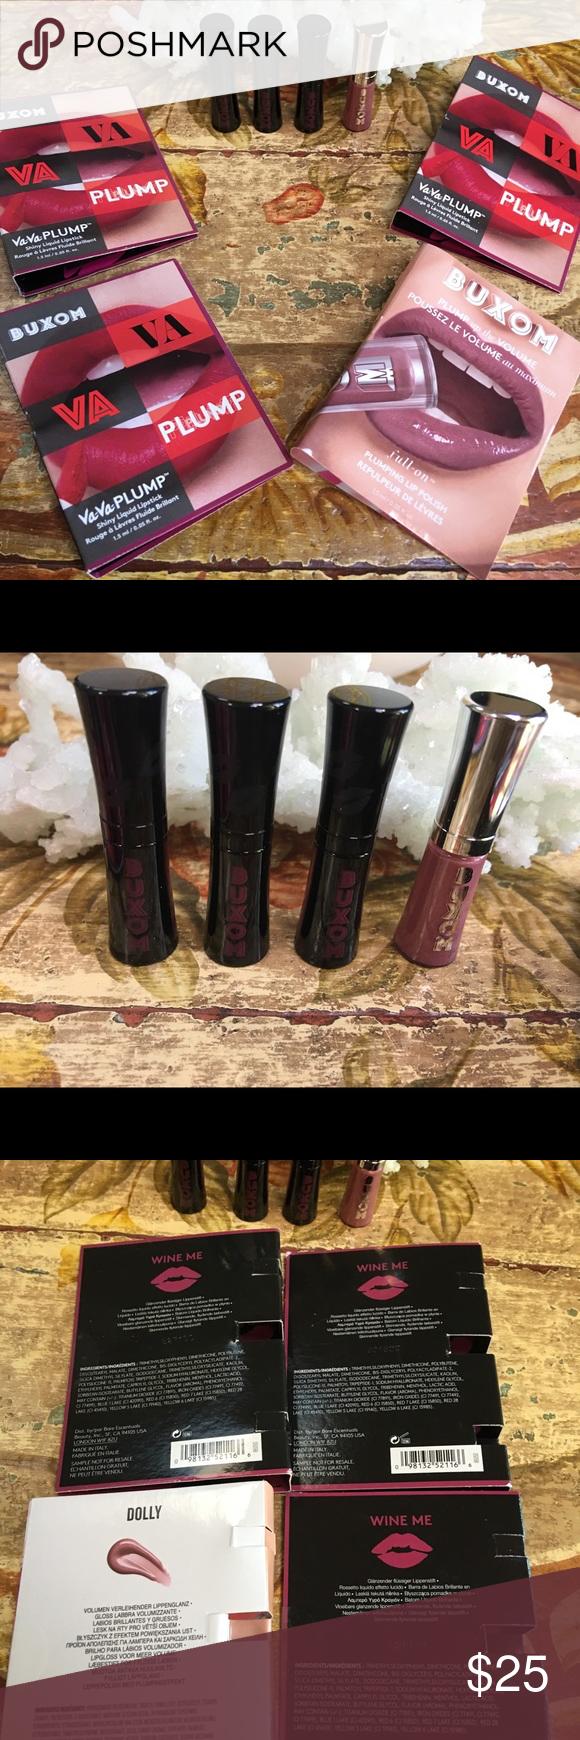 Buxom Va-Va-Plump Shiny Liquid Lipsticks Review - Kindly